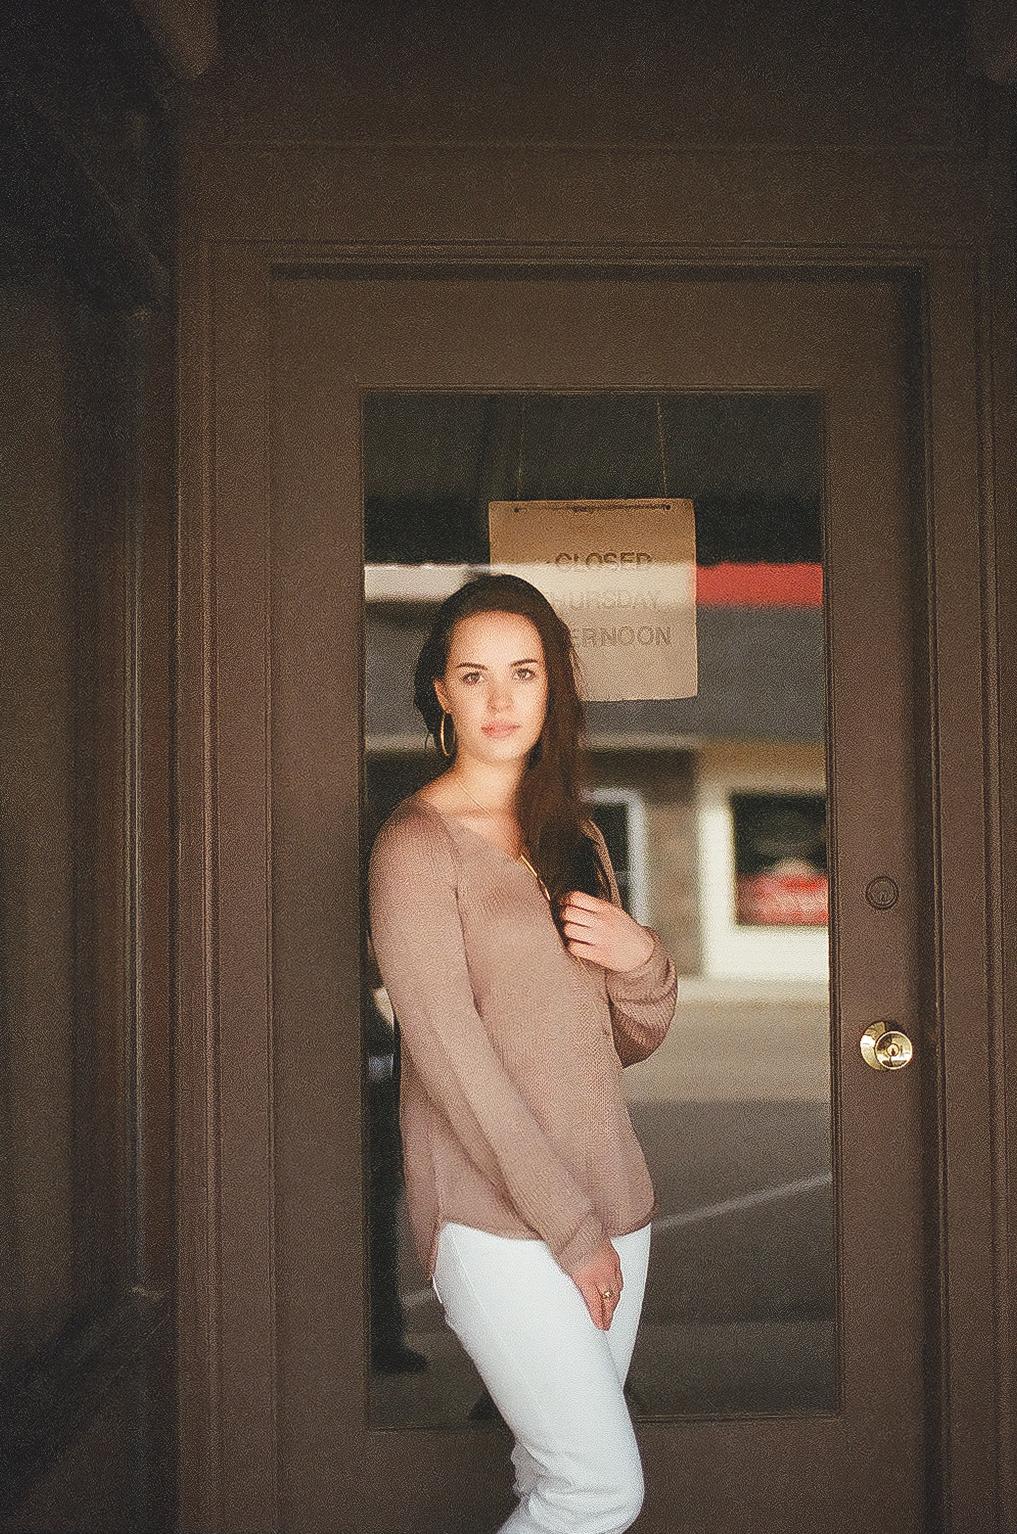 Emily Wilson Photography film camera Pentax 50 mm aged film